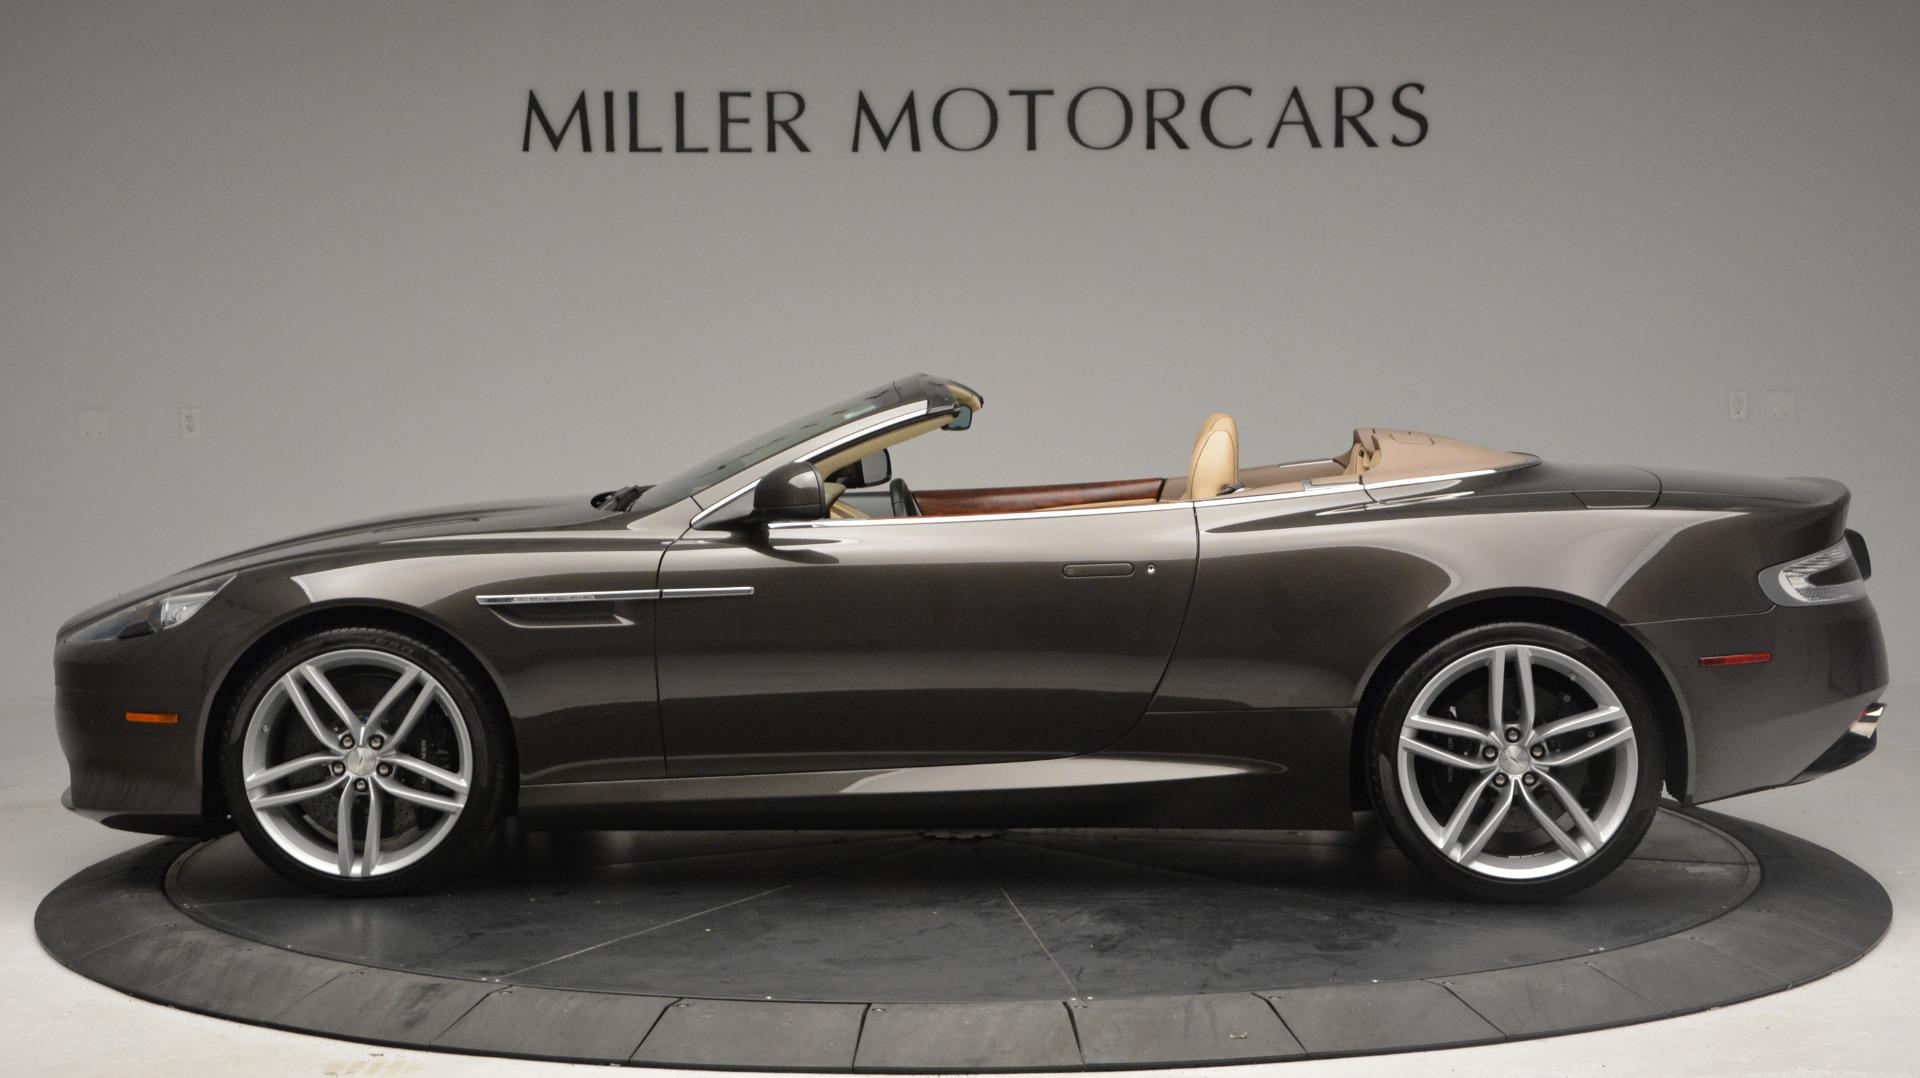 Used 2012 Aston Martin Virage Convertible For Sale In Greenwich, CT. Alfa Romeo of Greenwich, 7613 3351_p2